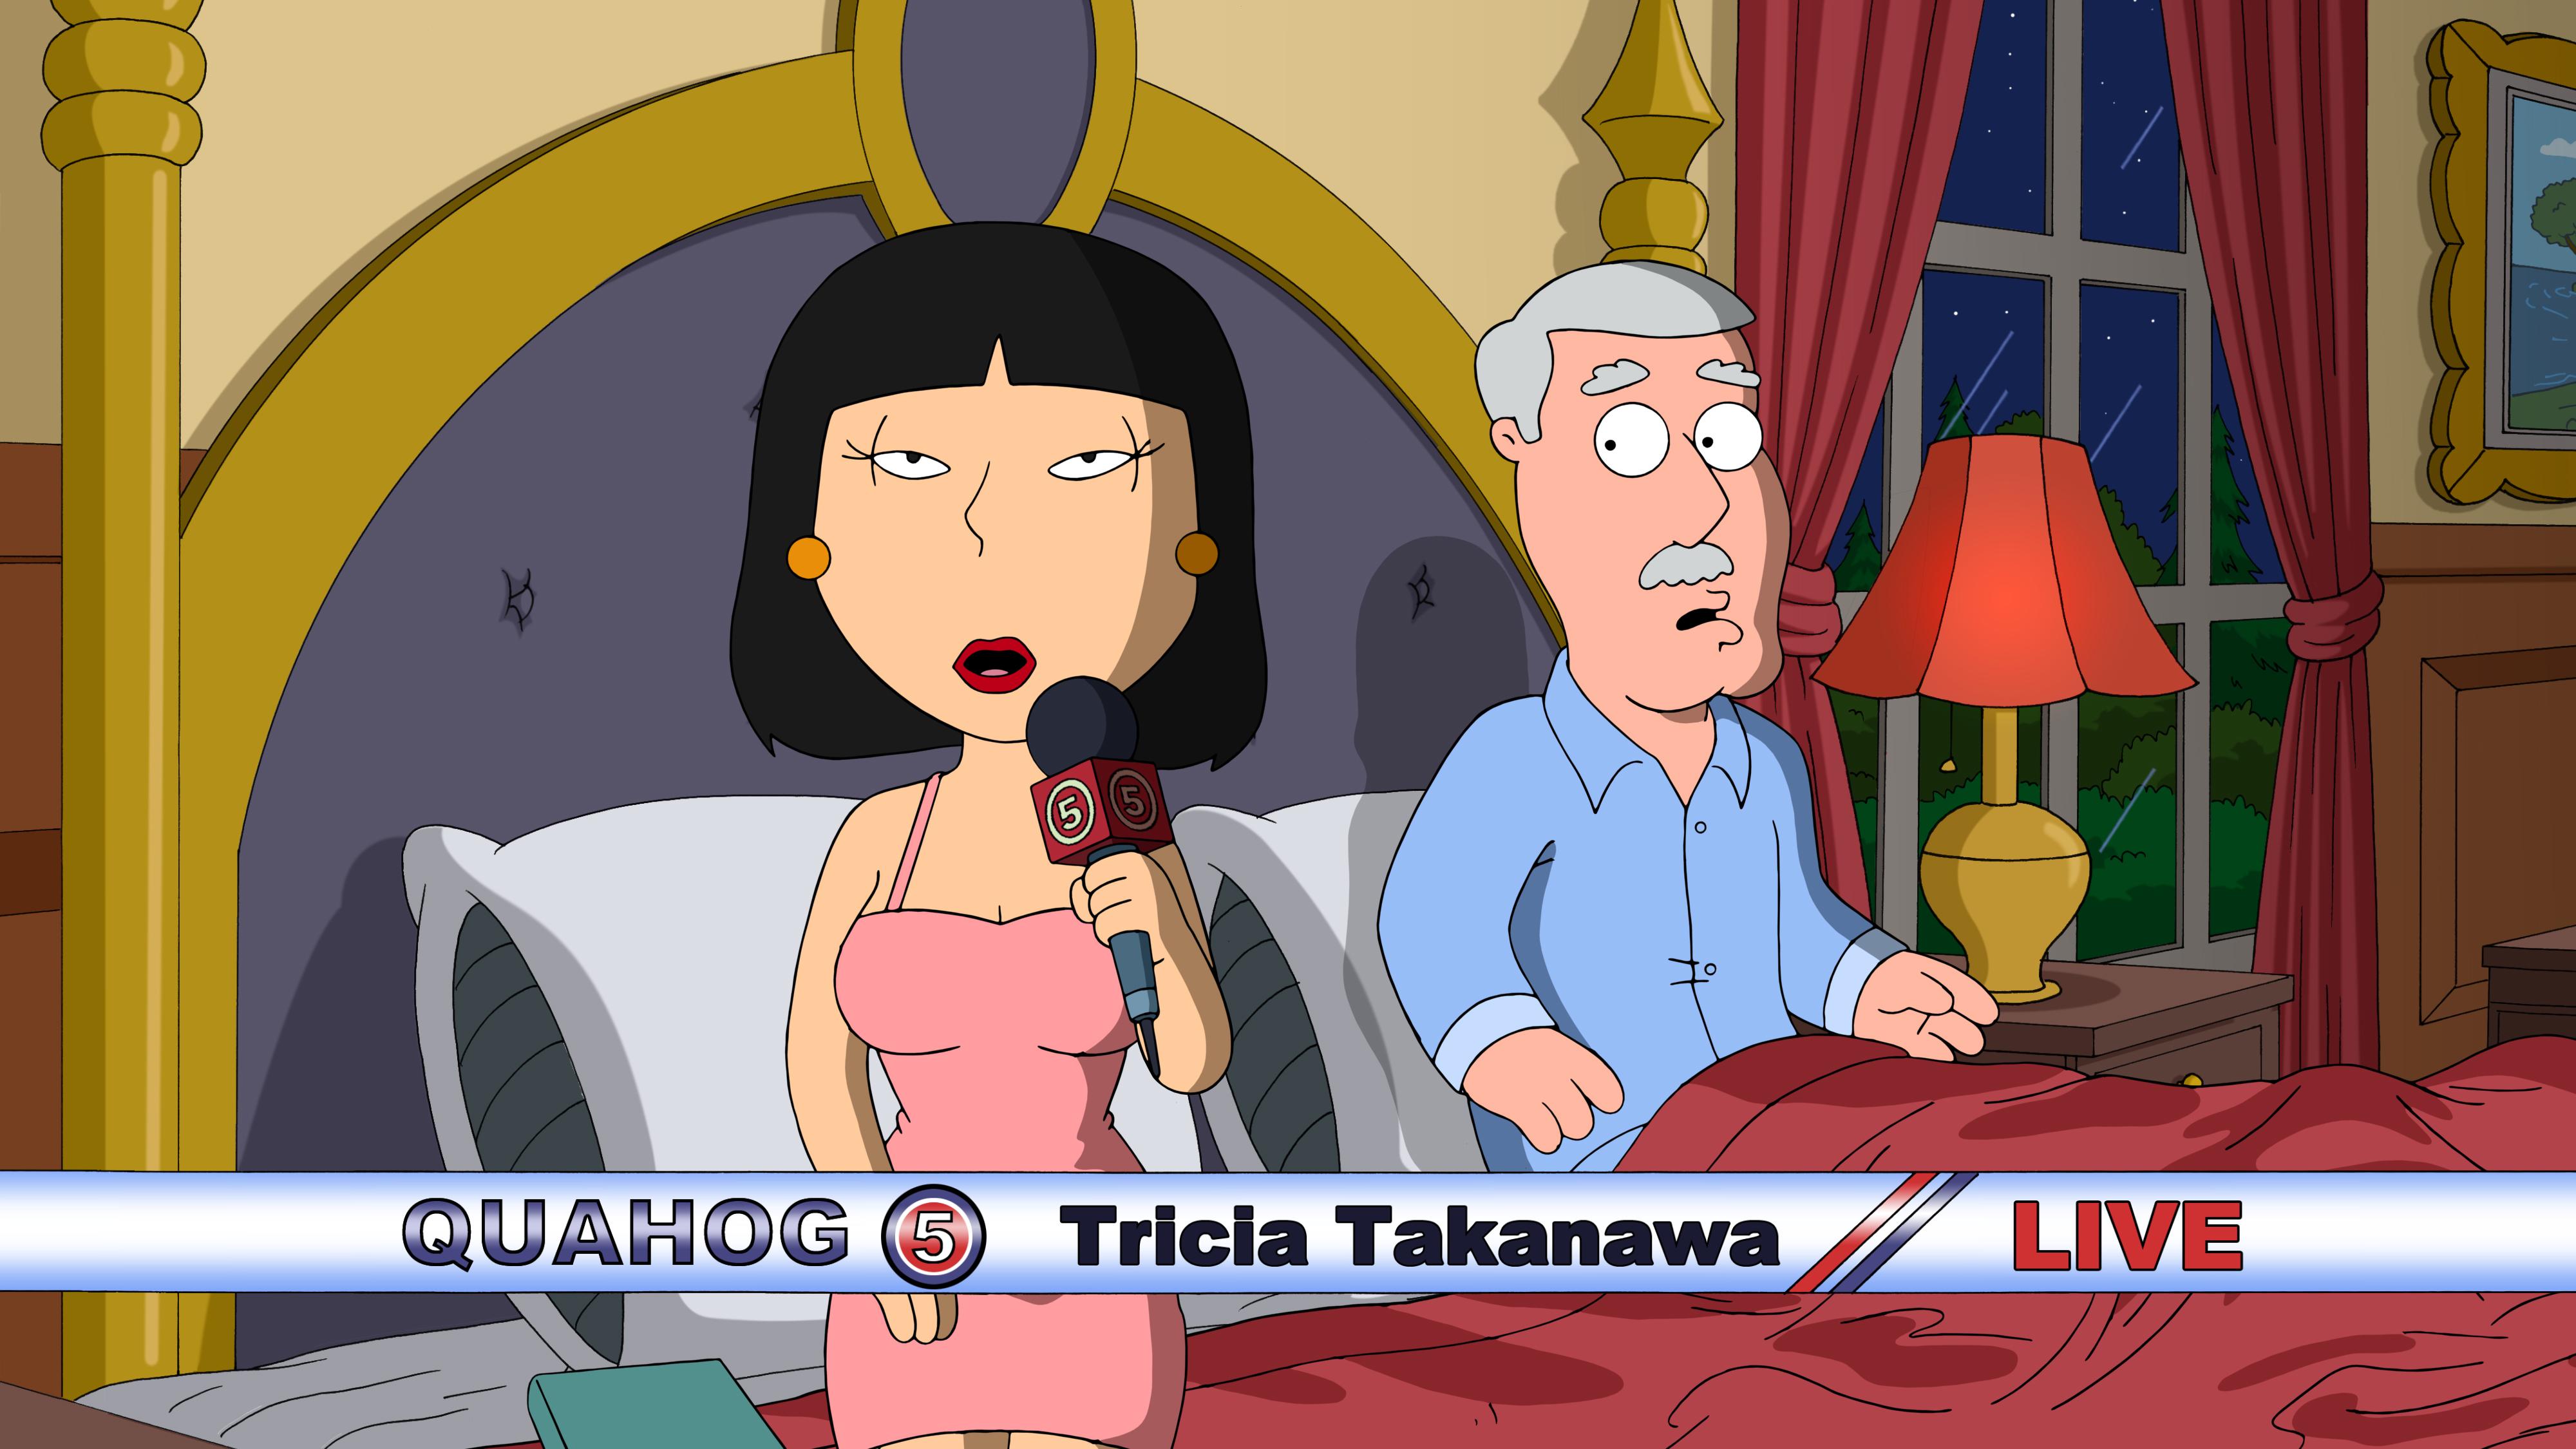 Asian reporter tricia takanawa me?